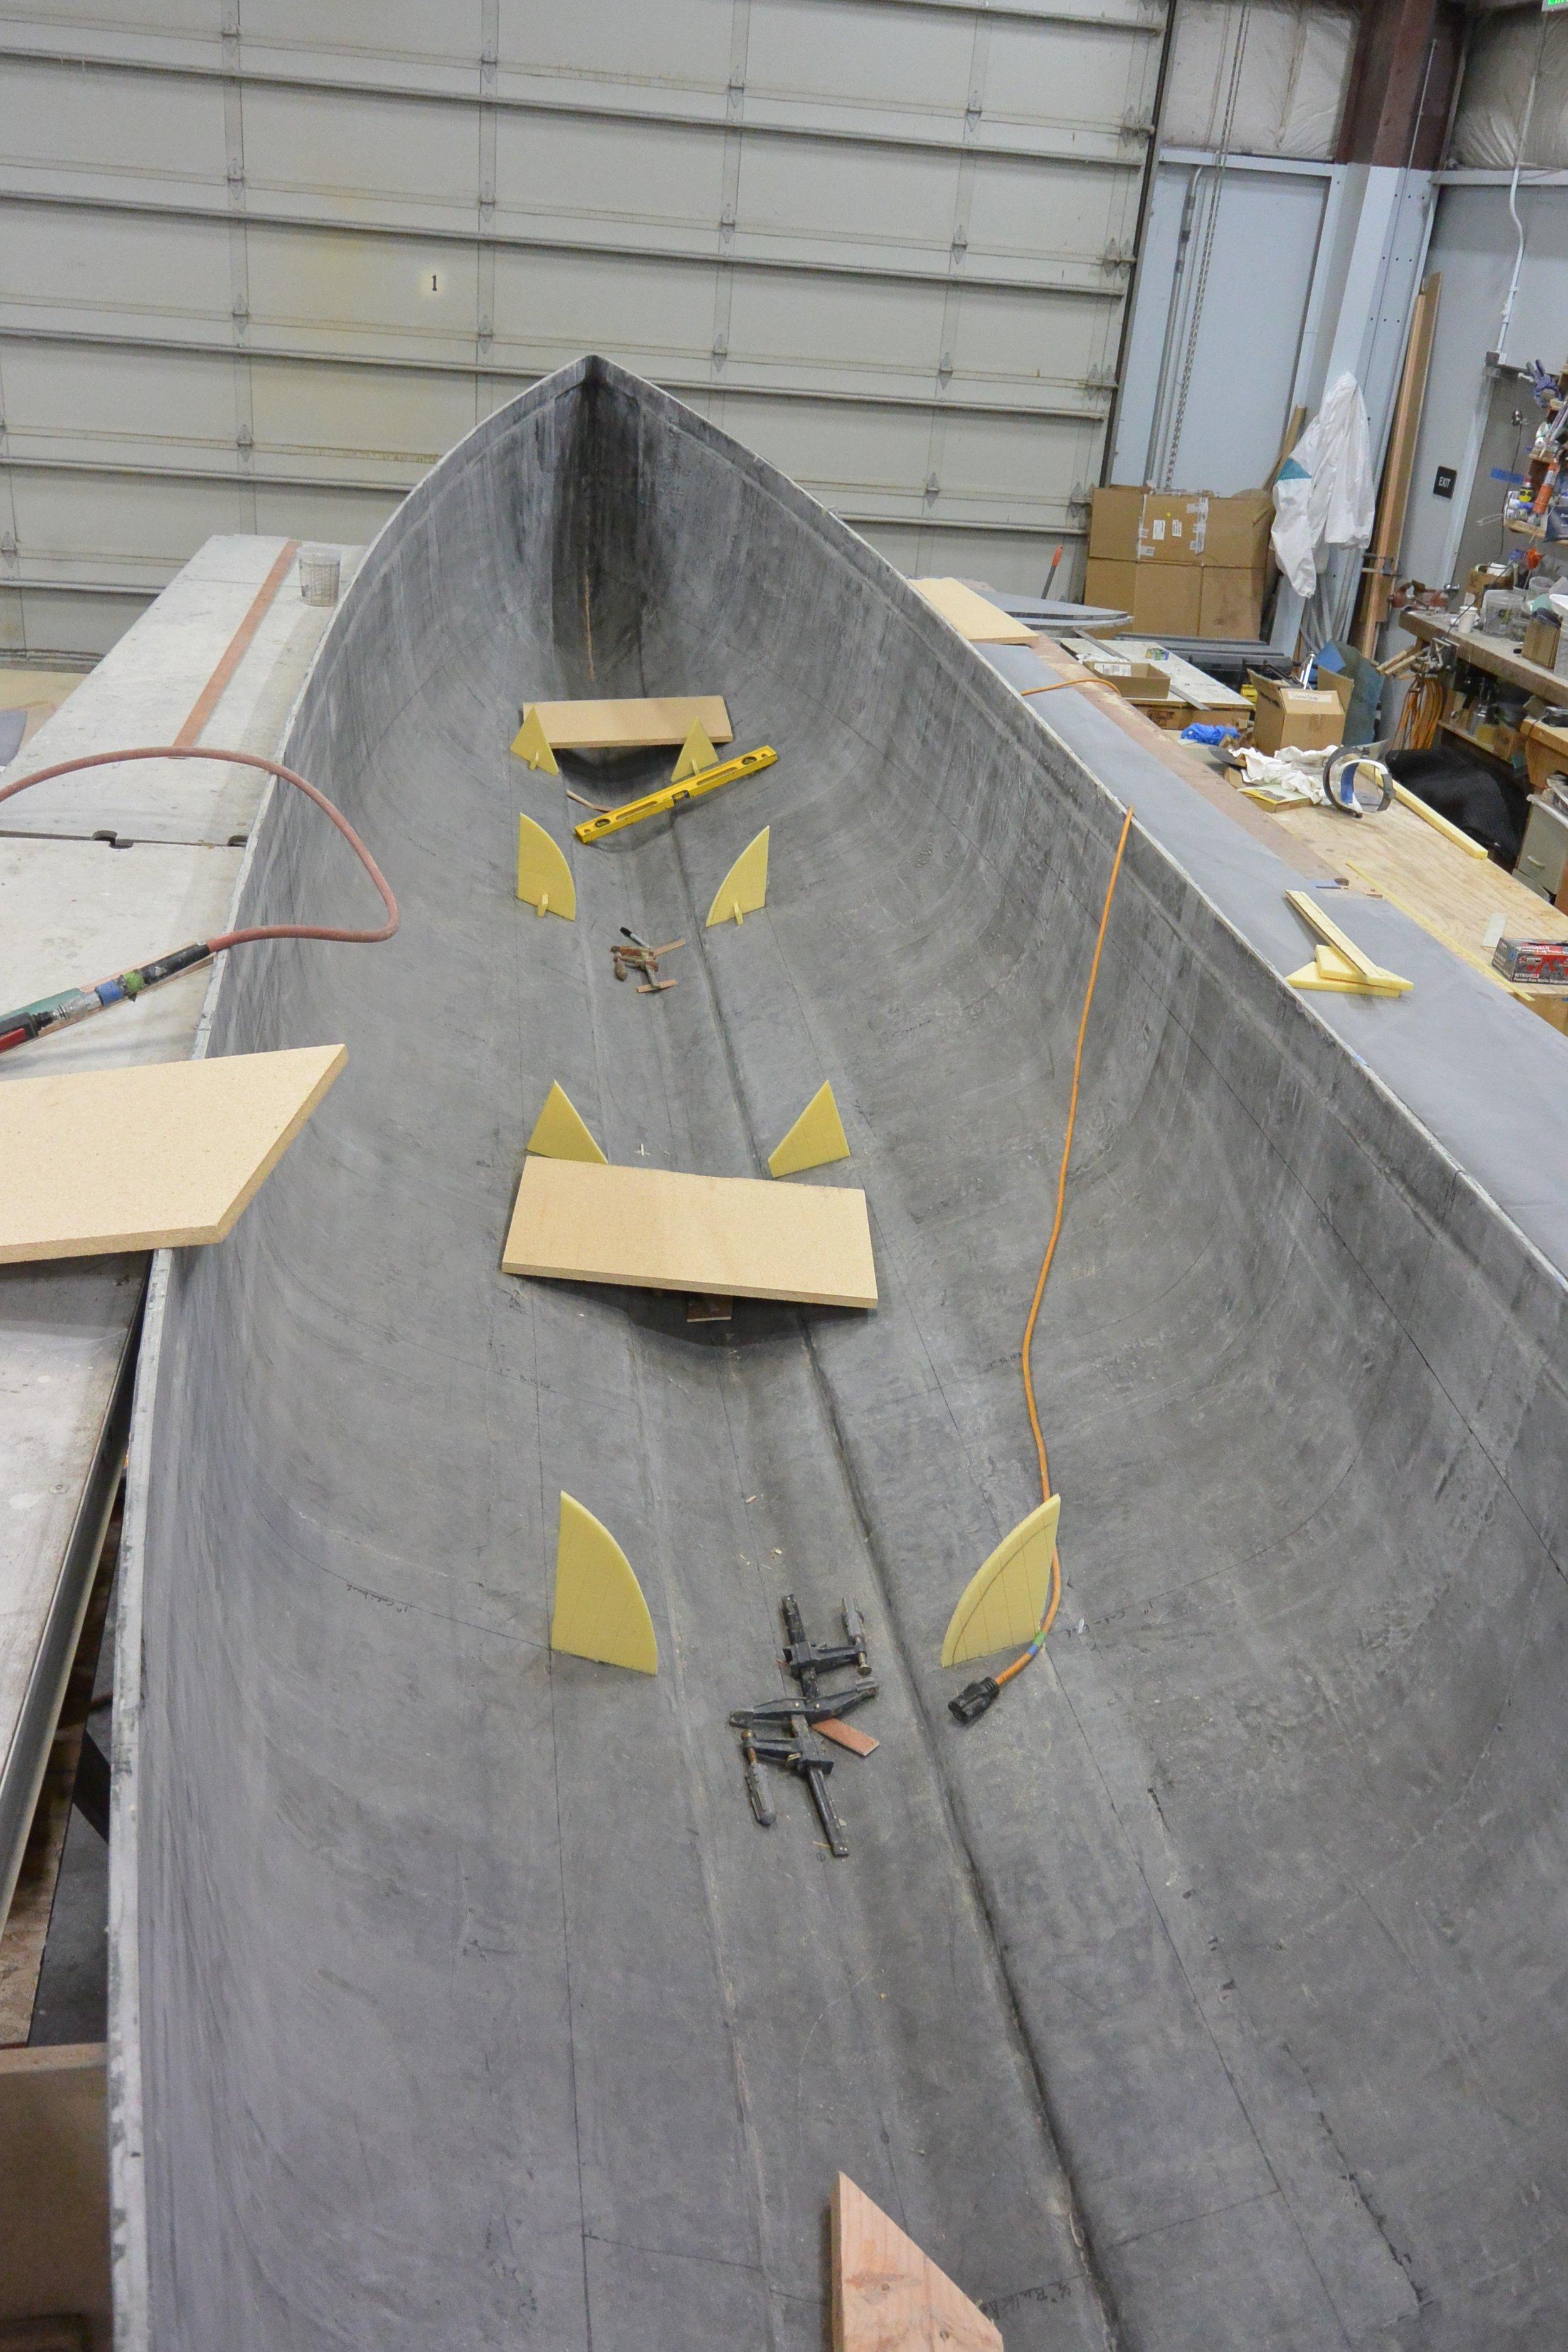 Hull Preparation